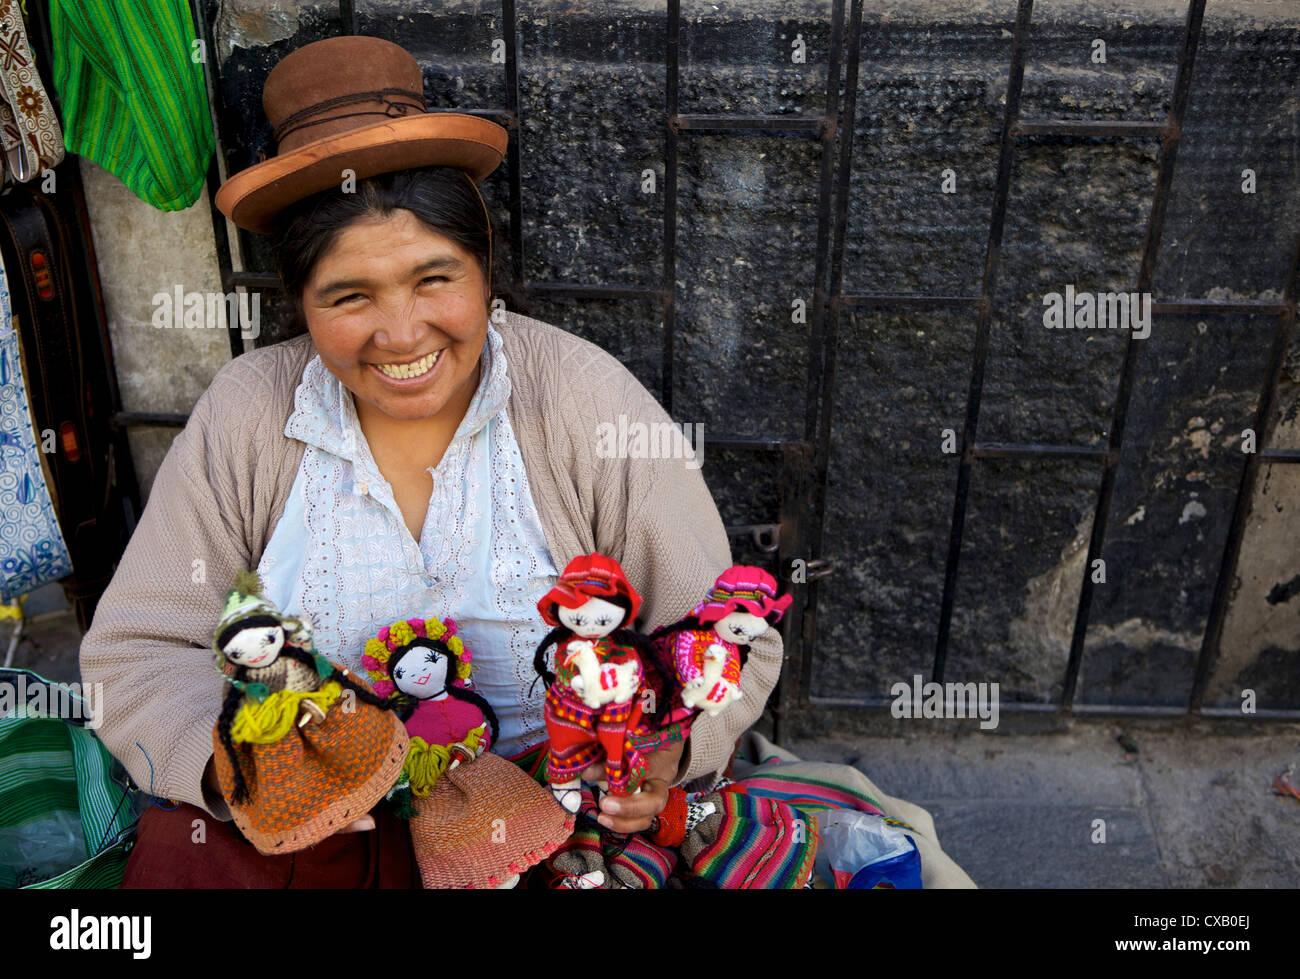 Indigenous lady selling dolls, Arequipa, Peru, South America - Stock Image